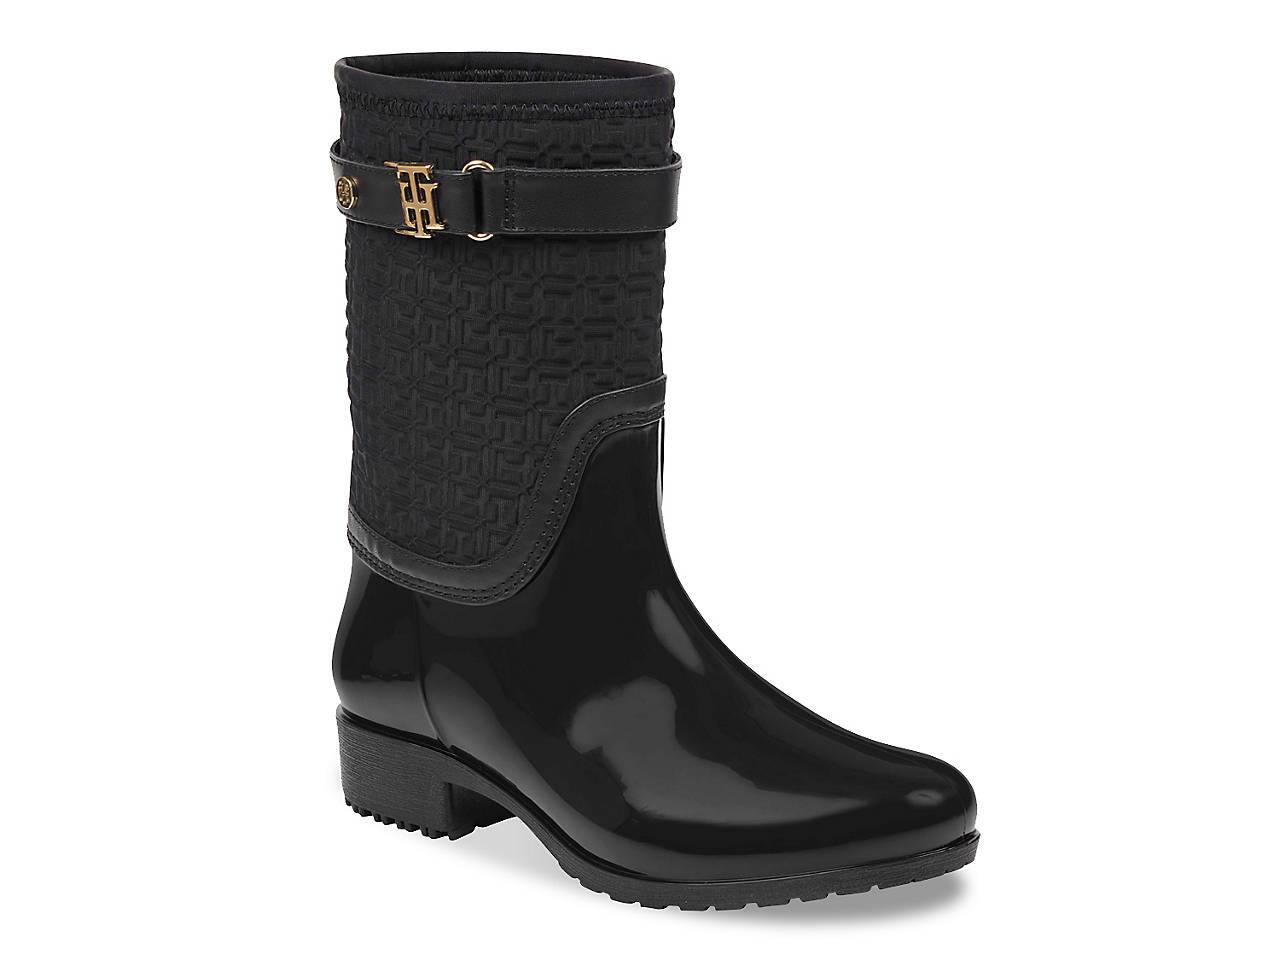 Floredo Rain Boot by Tommy Hilfiger